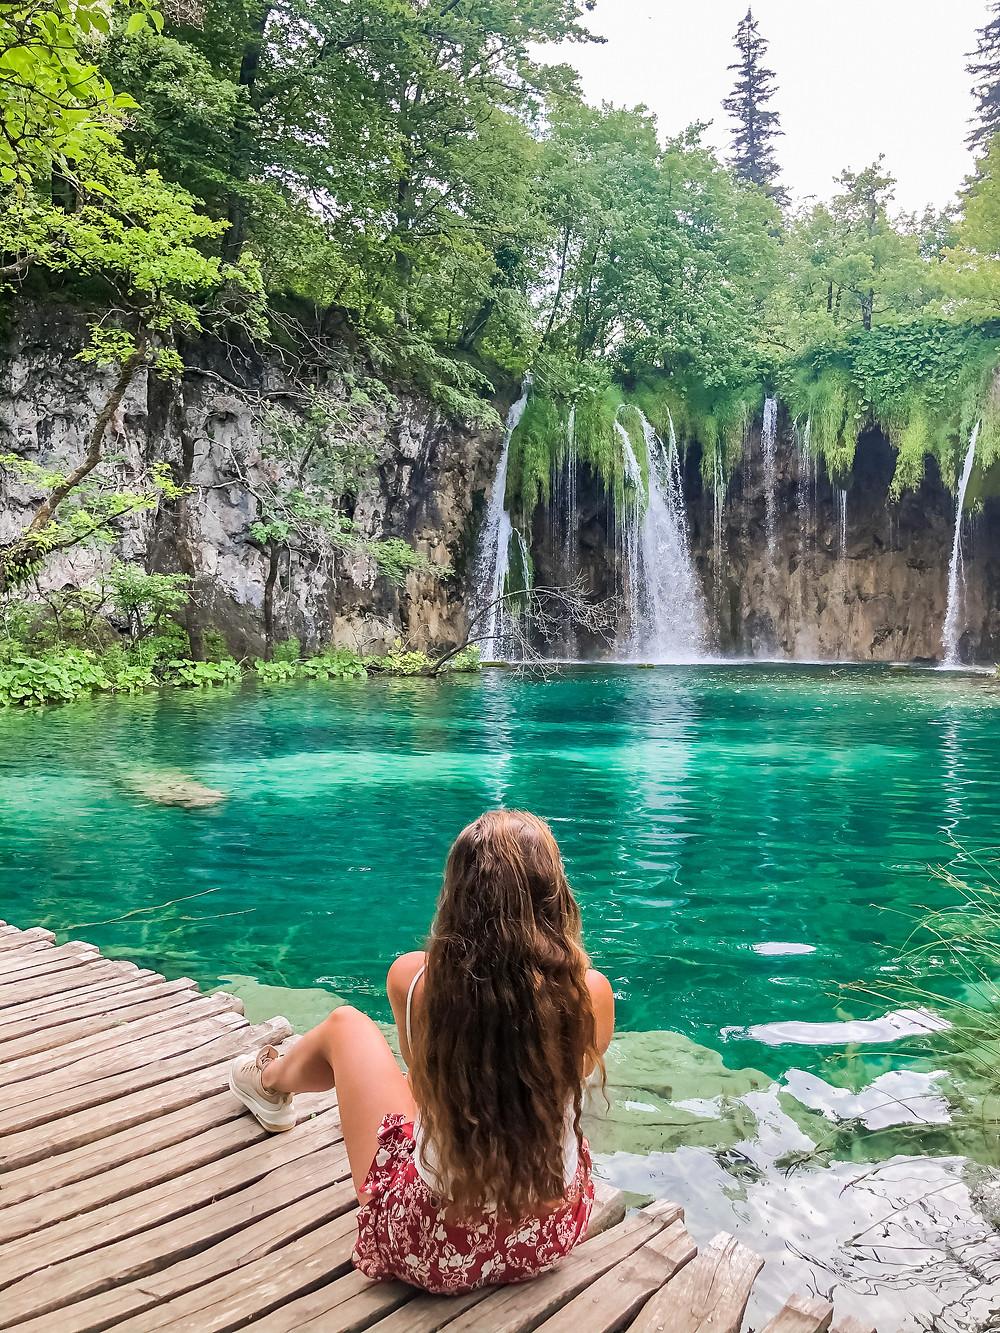 Plitvicer-seen-reisebericht-reiseblog-kroatien-urlaub